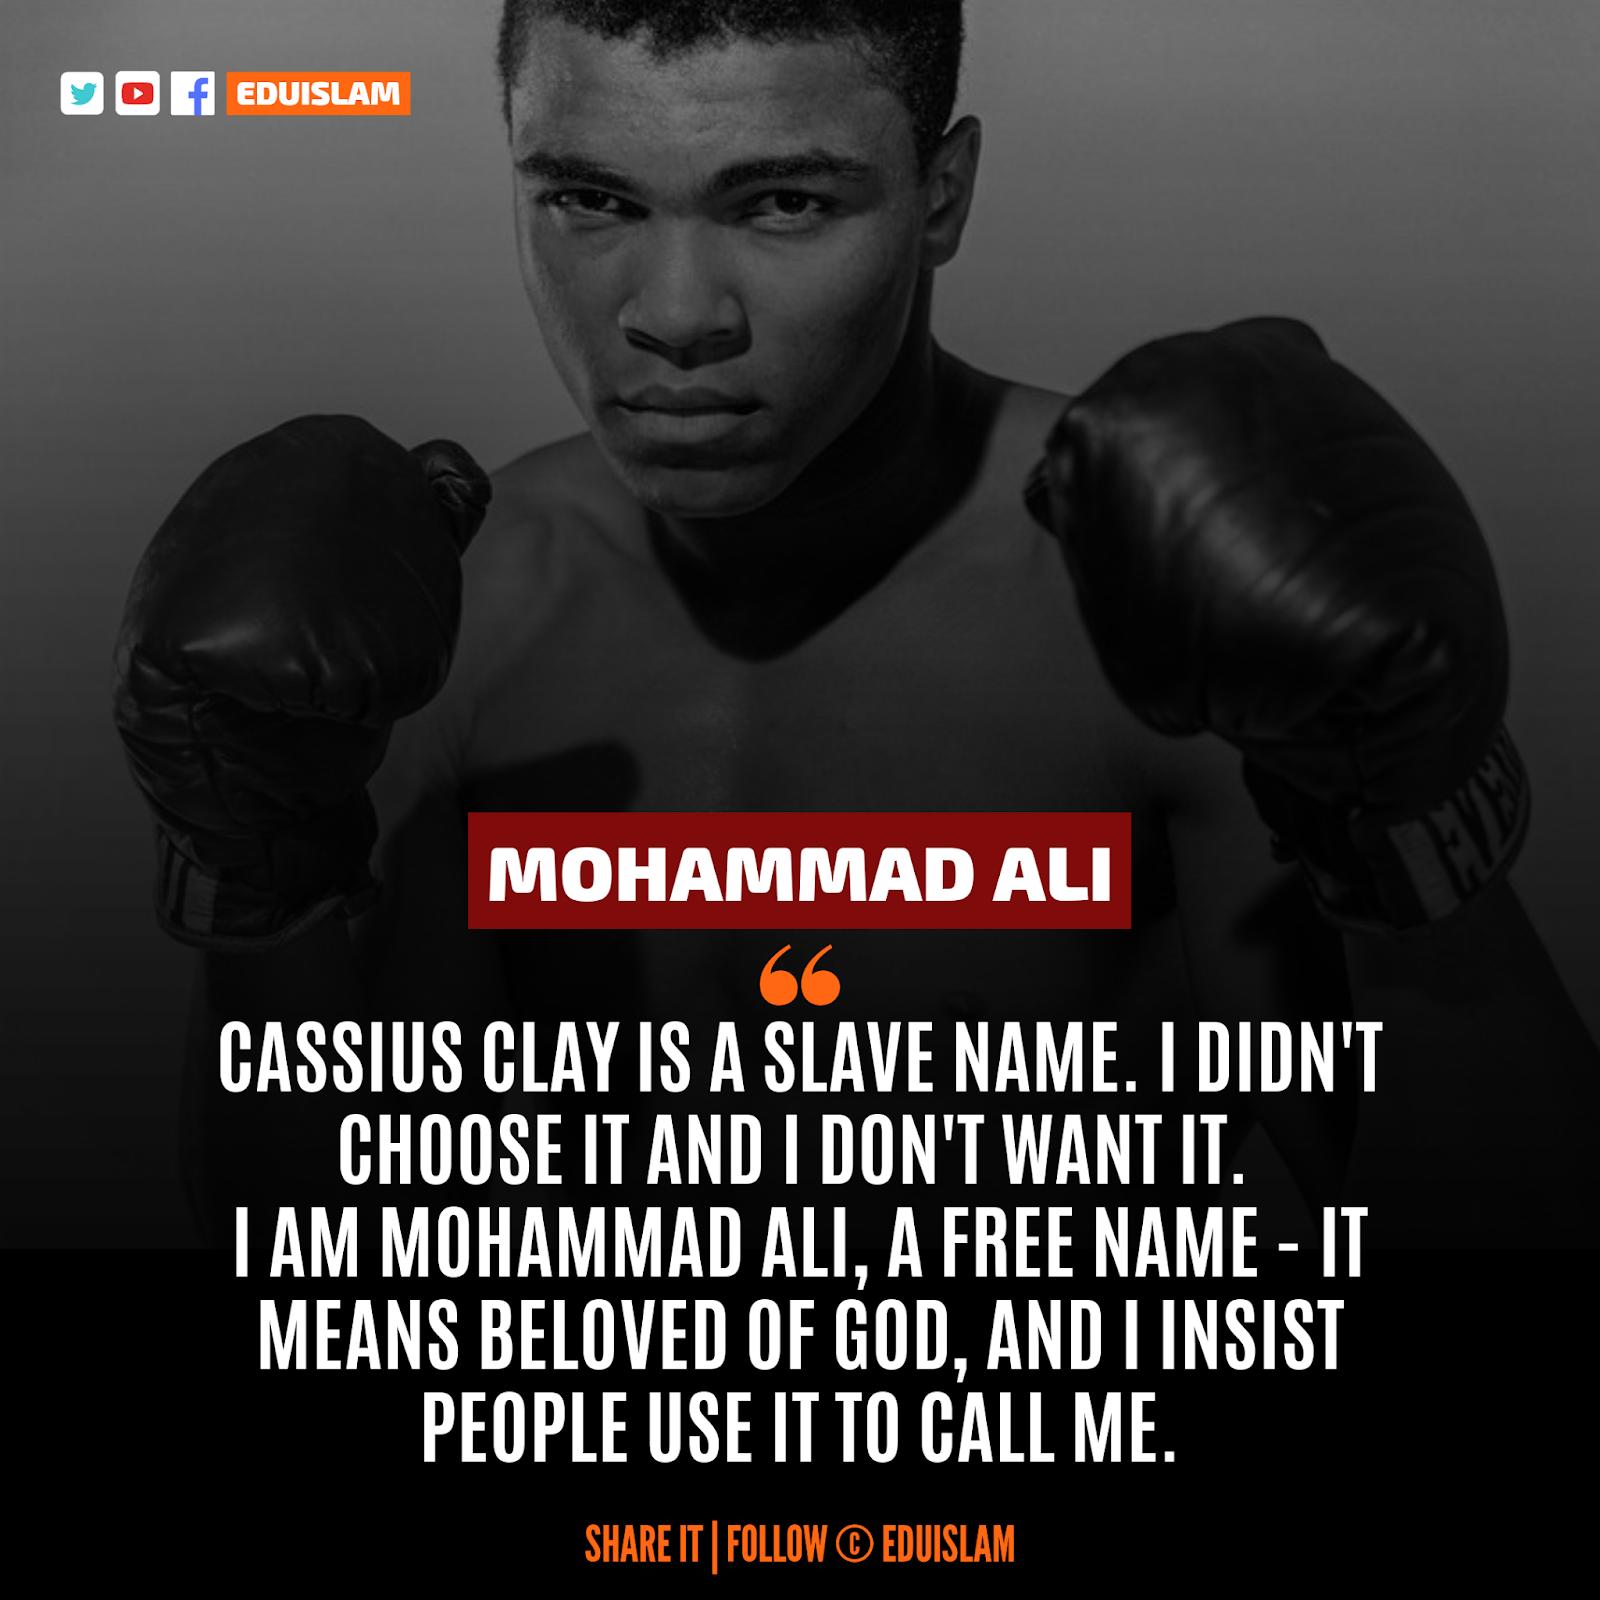 Mohammad Ali Conversion To Islam, Mohammad Ali Story, Why Mohammad Ali Converted To Islam, EduIslam